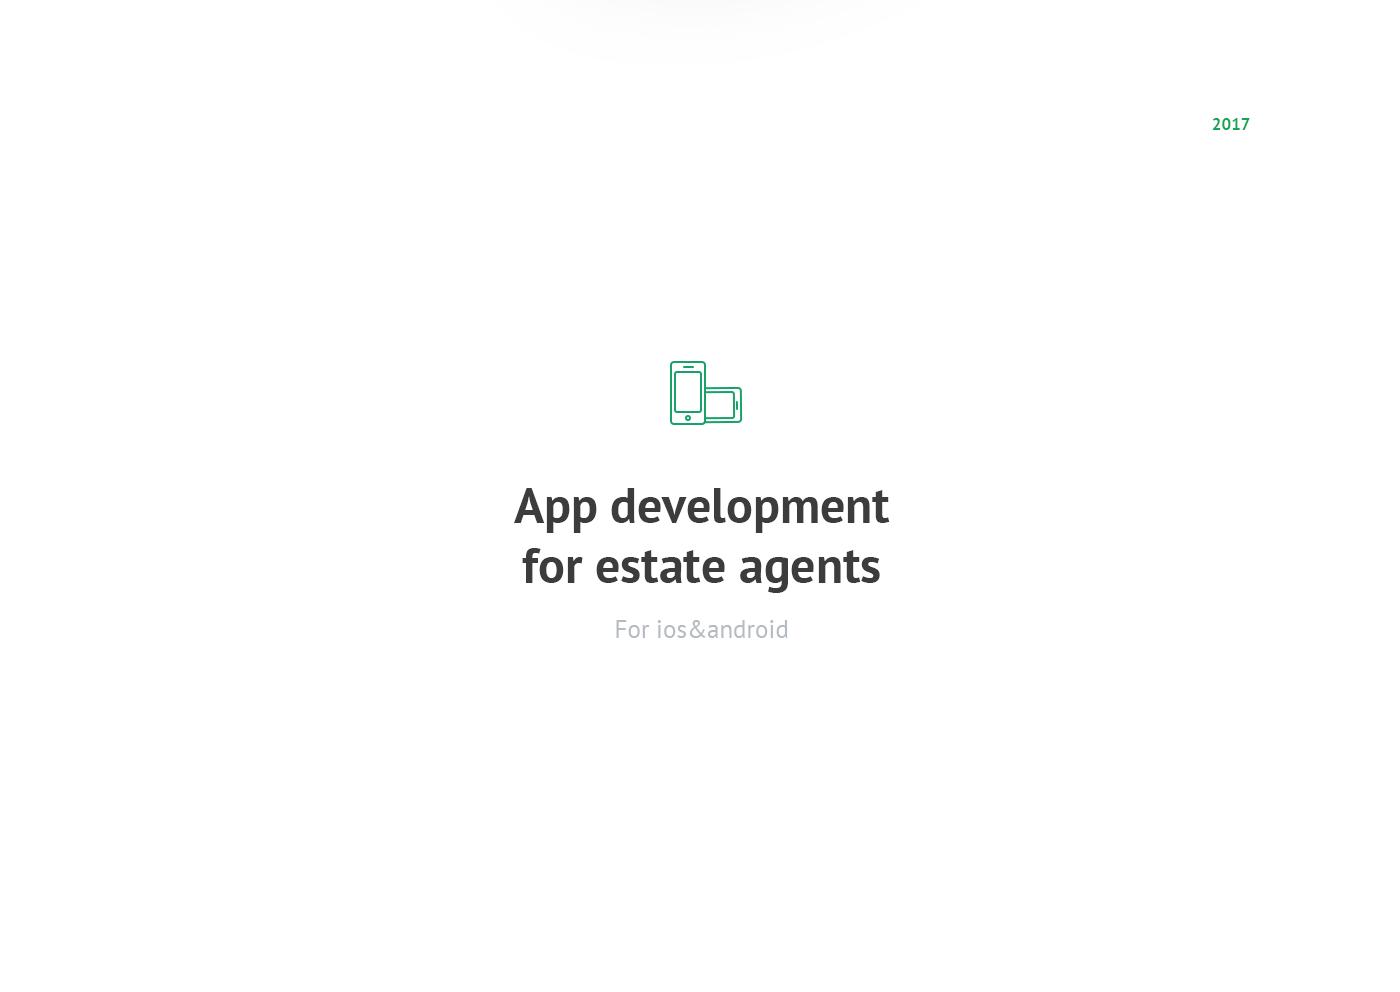 ux UI Mobile app app ILLUSTRATION  Usability